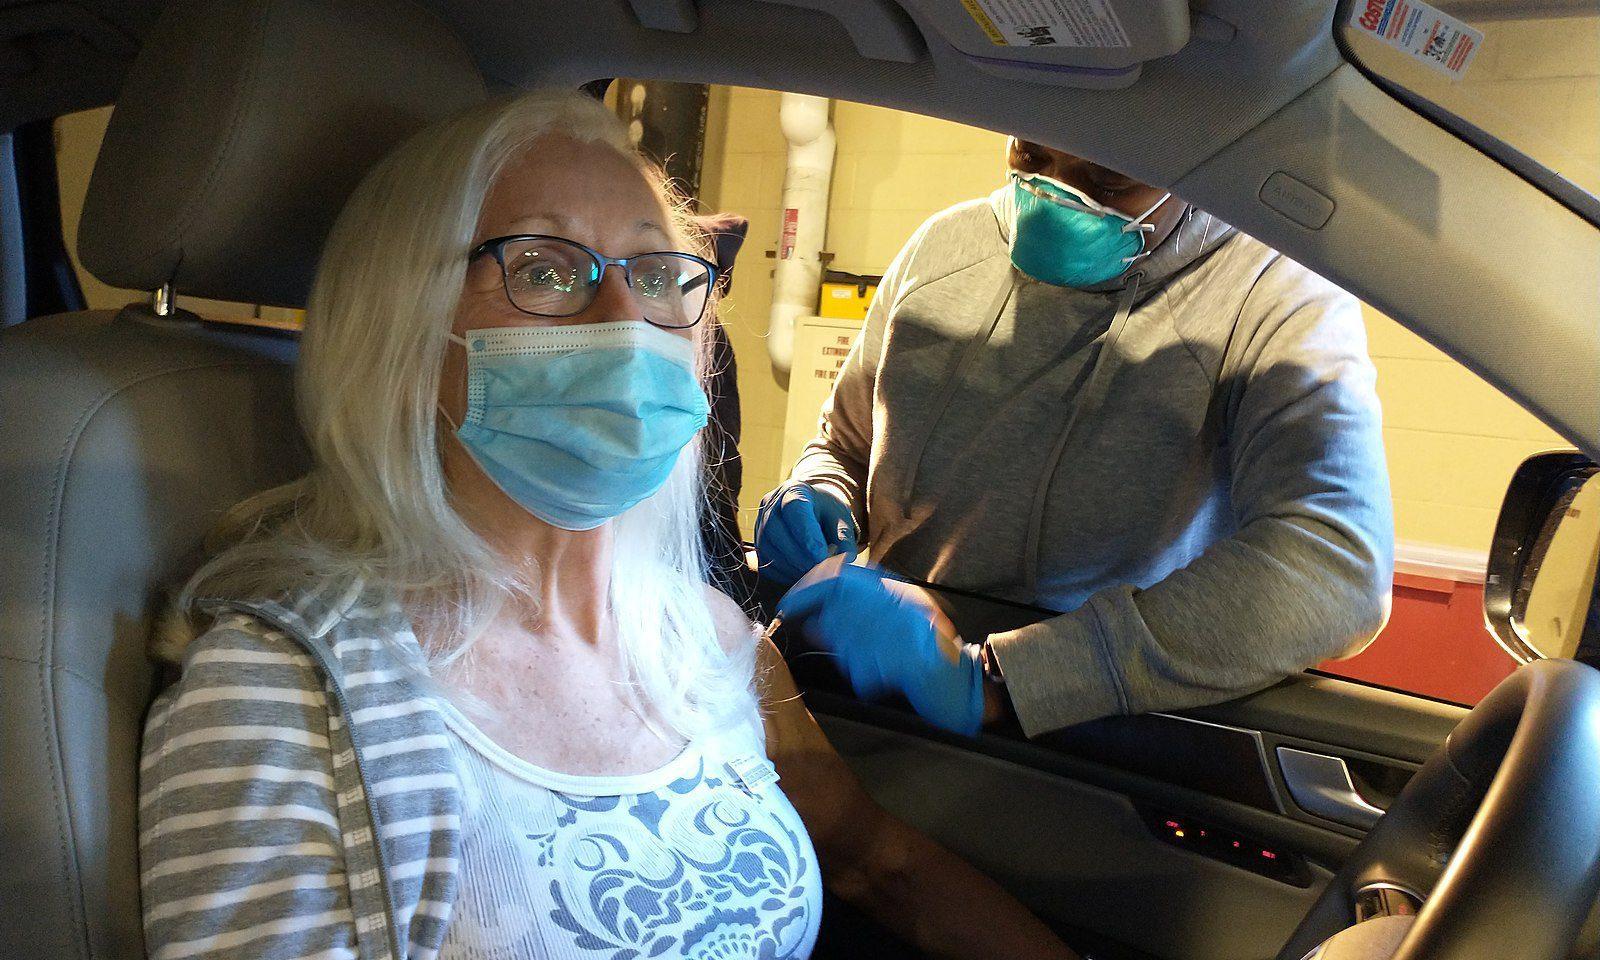 Impfung im Auto